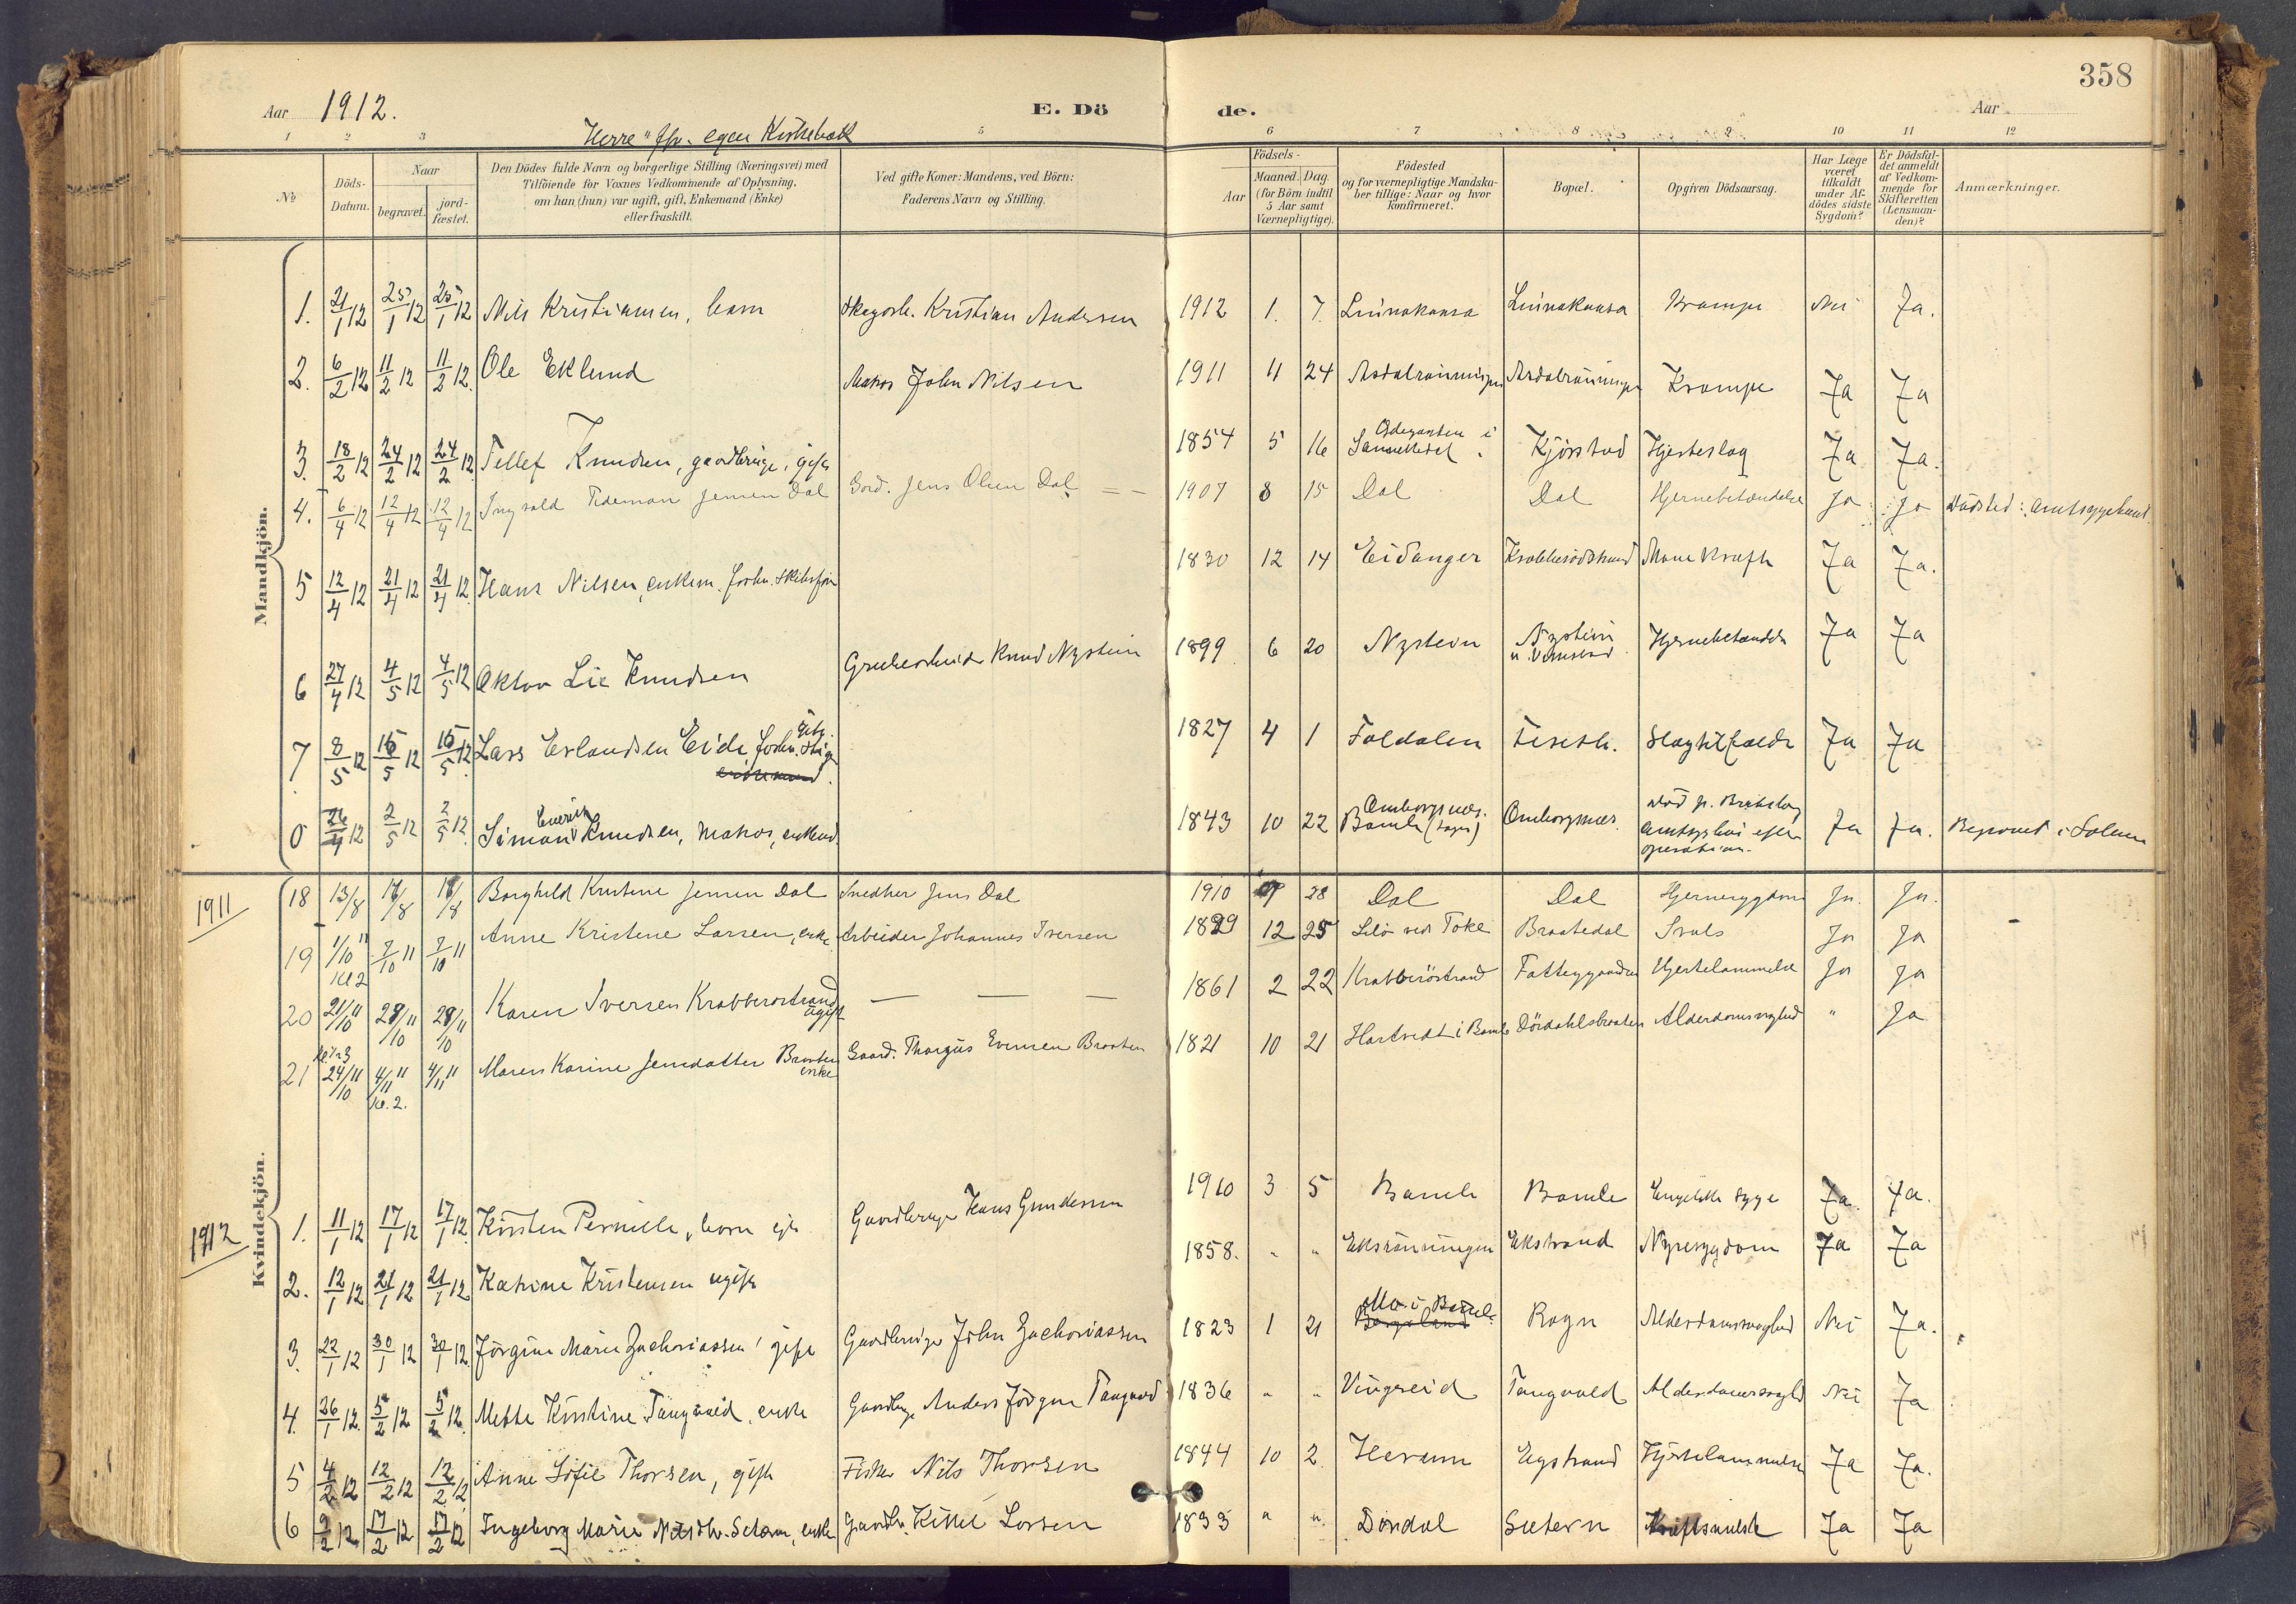 SAKO, Bamble kirkebøker, F/Fa/L0009: Ministerialbok nr. I 9, 1901-1917, s. 358